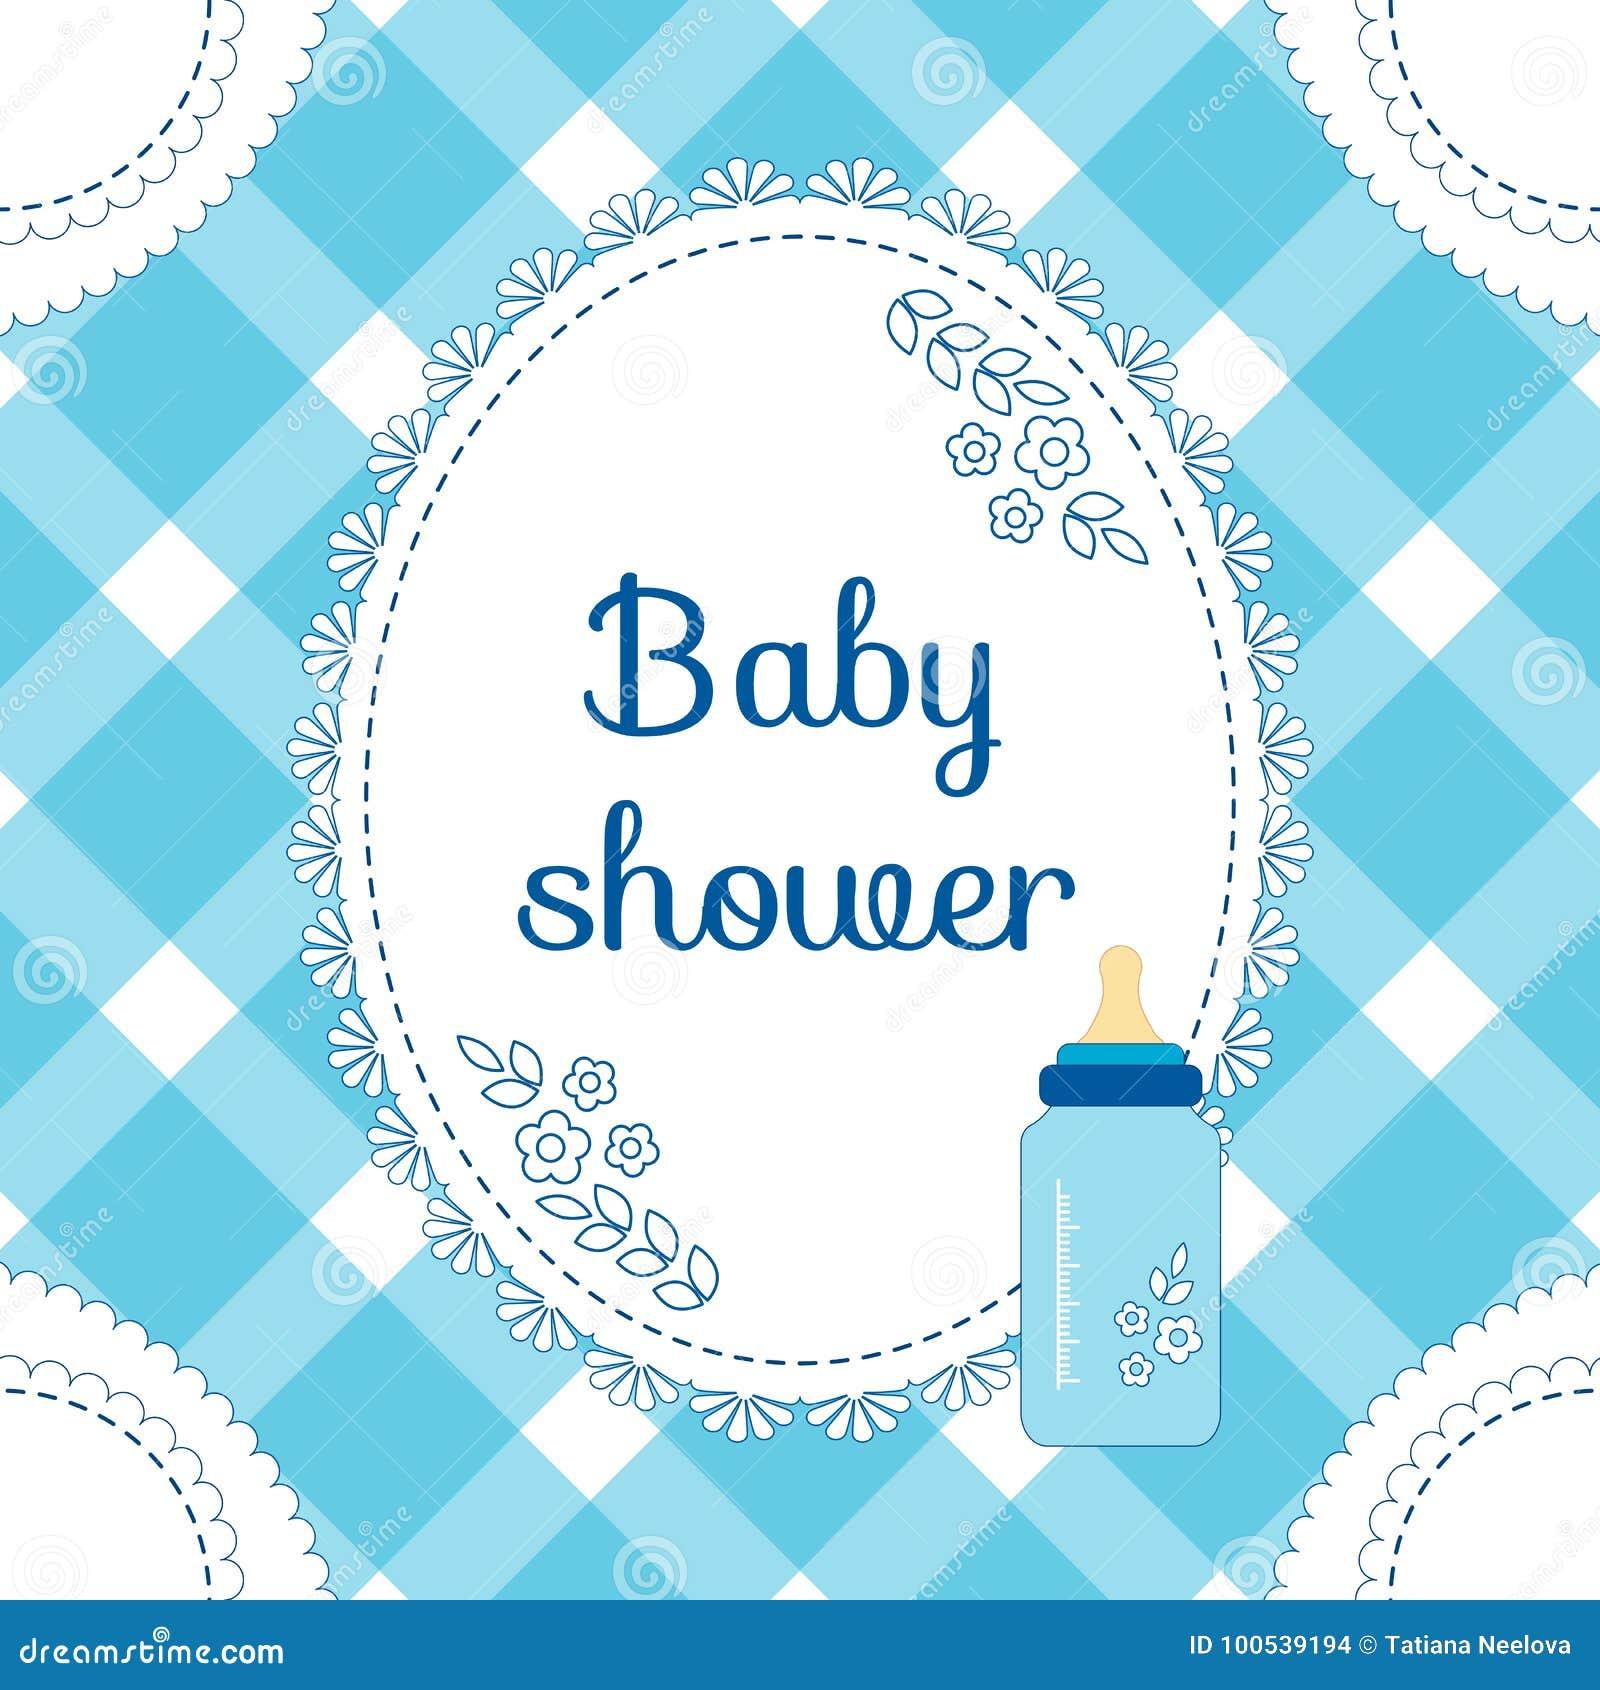 Baby shower invitation card baby boy arrival shower greeting baby shower invitation card baby boy arrival shower greeting announcement card with filmwisefo